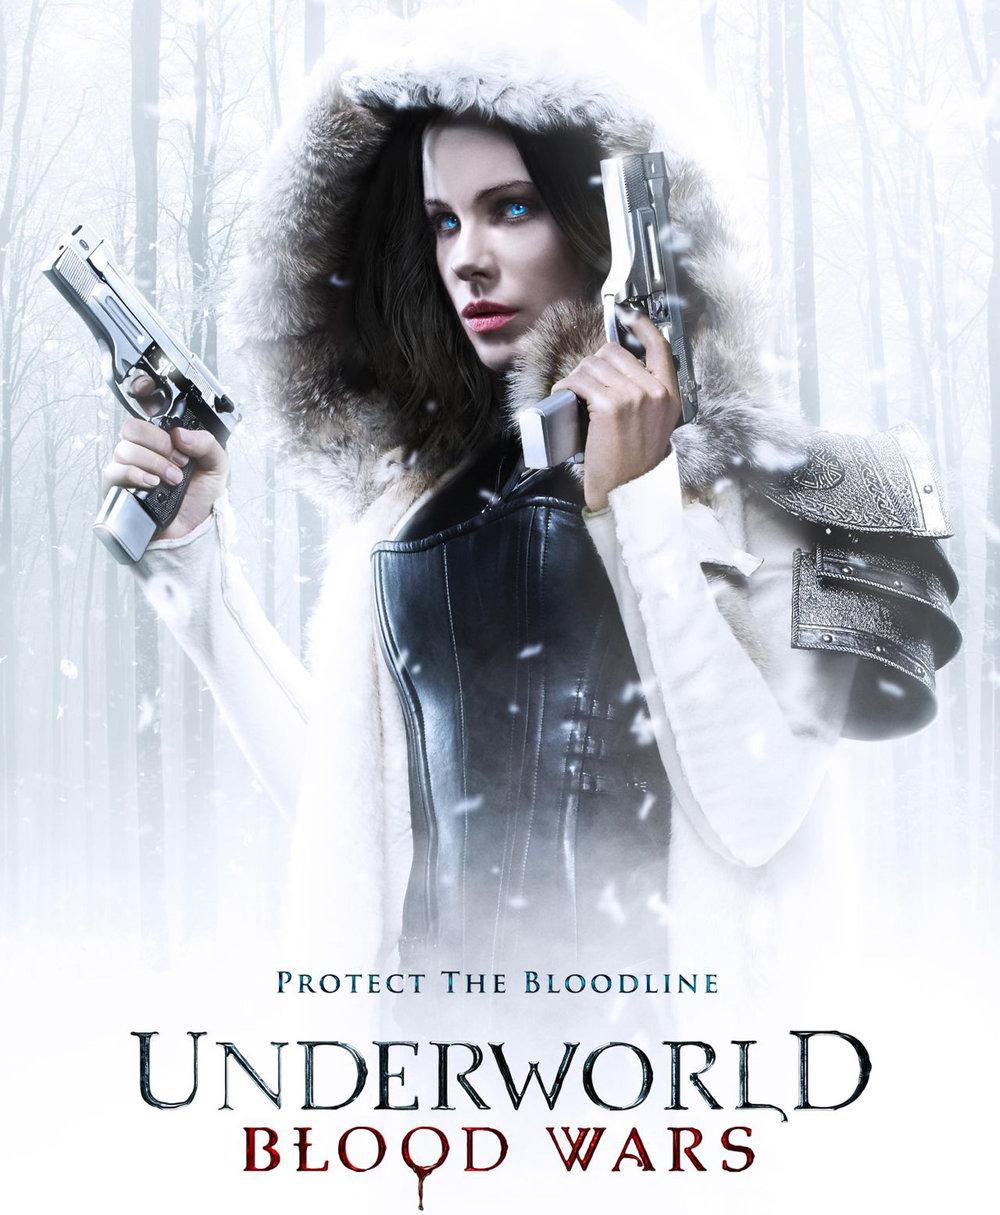 underworldbw.jpg